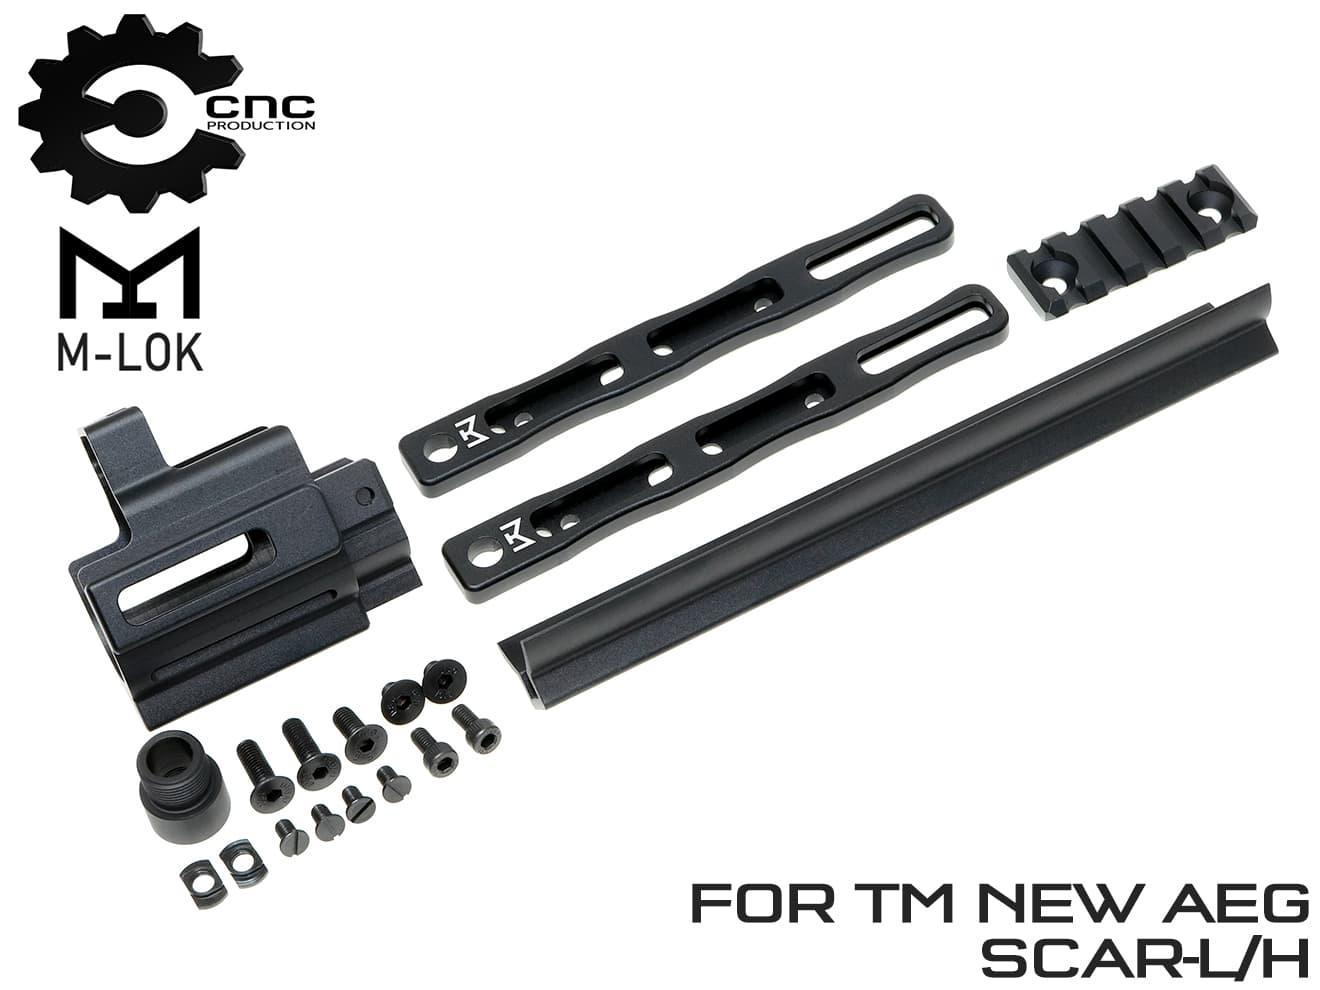 CNC Production アルミCNC MRE M-LOKレールエクステンションKIT マルイ SCARシリーズ◆TM 次世代電動ガン SCAR-L/H エムロック変換 CQC可